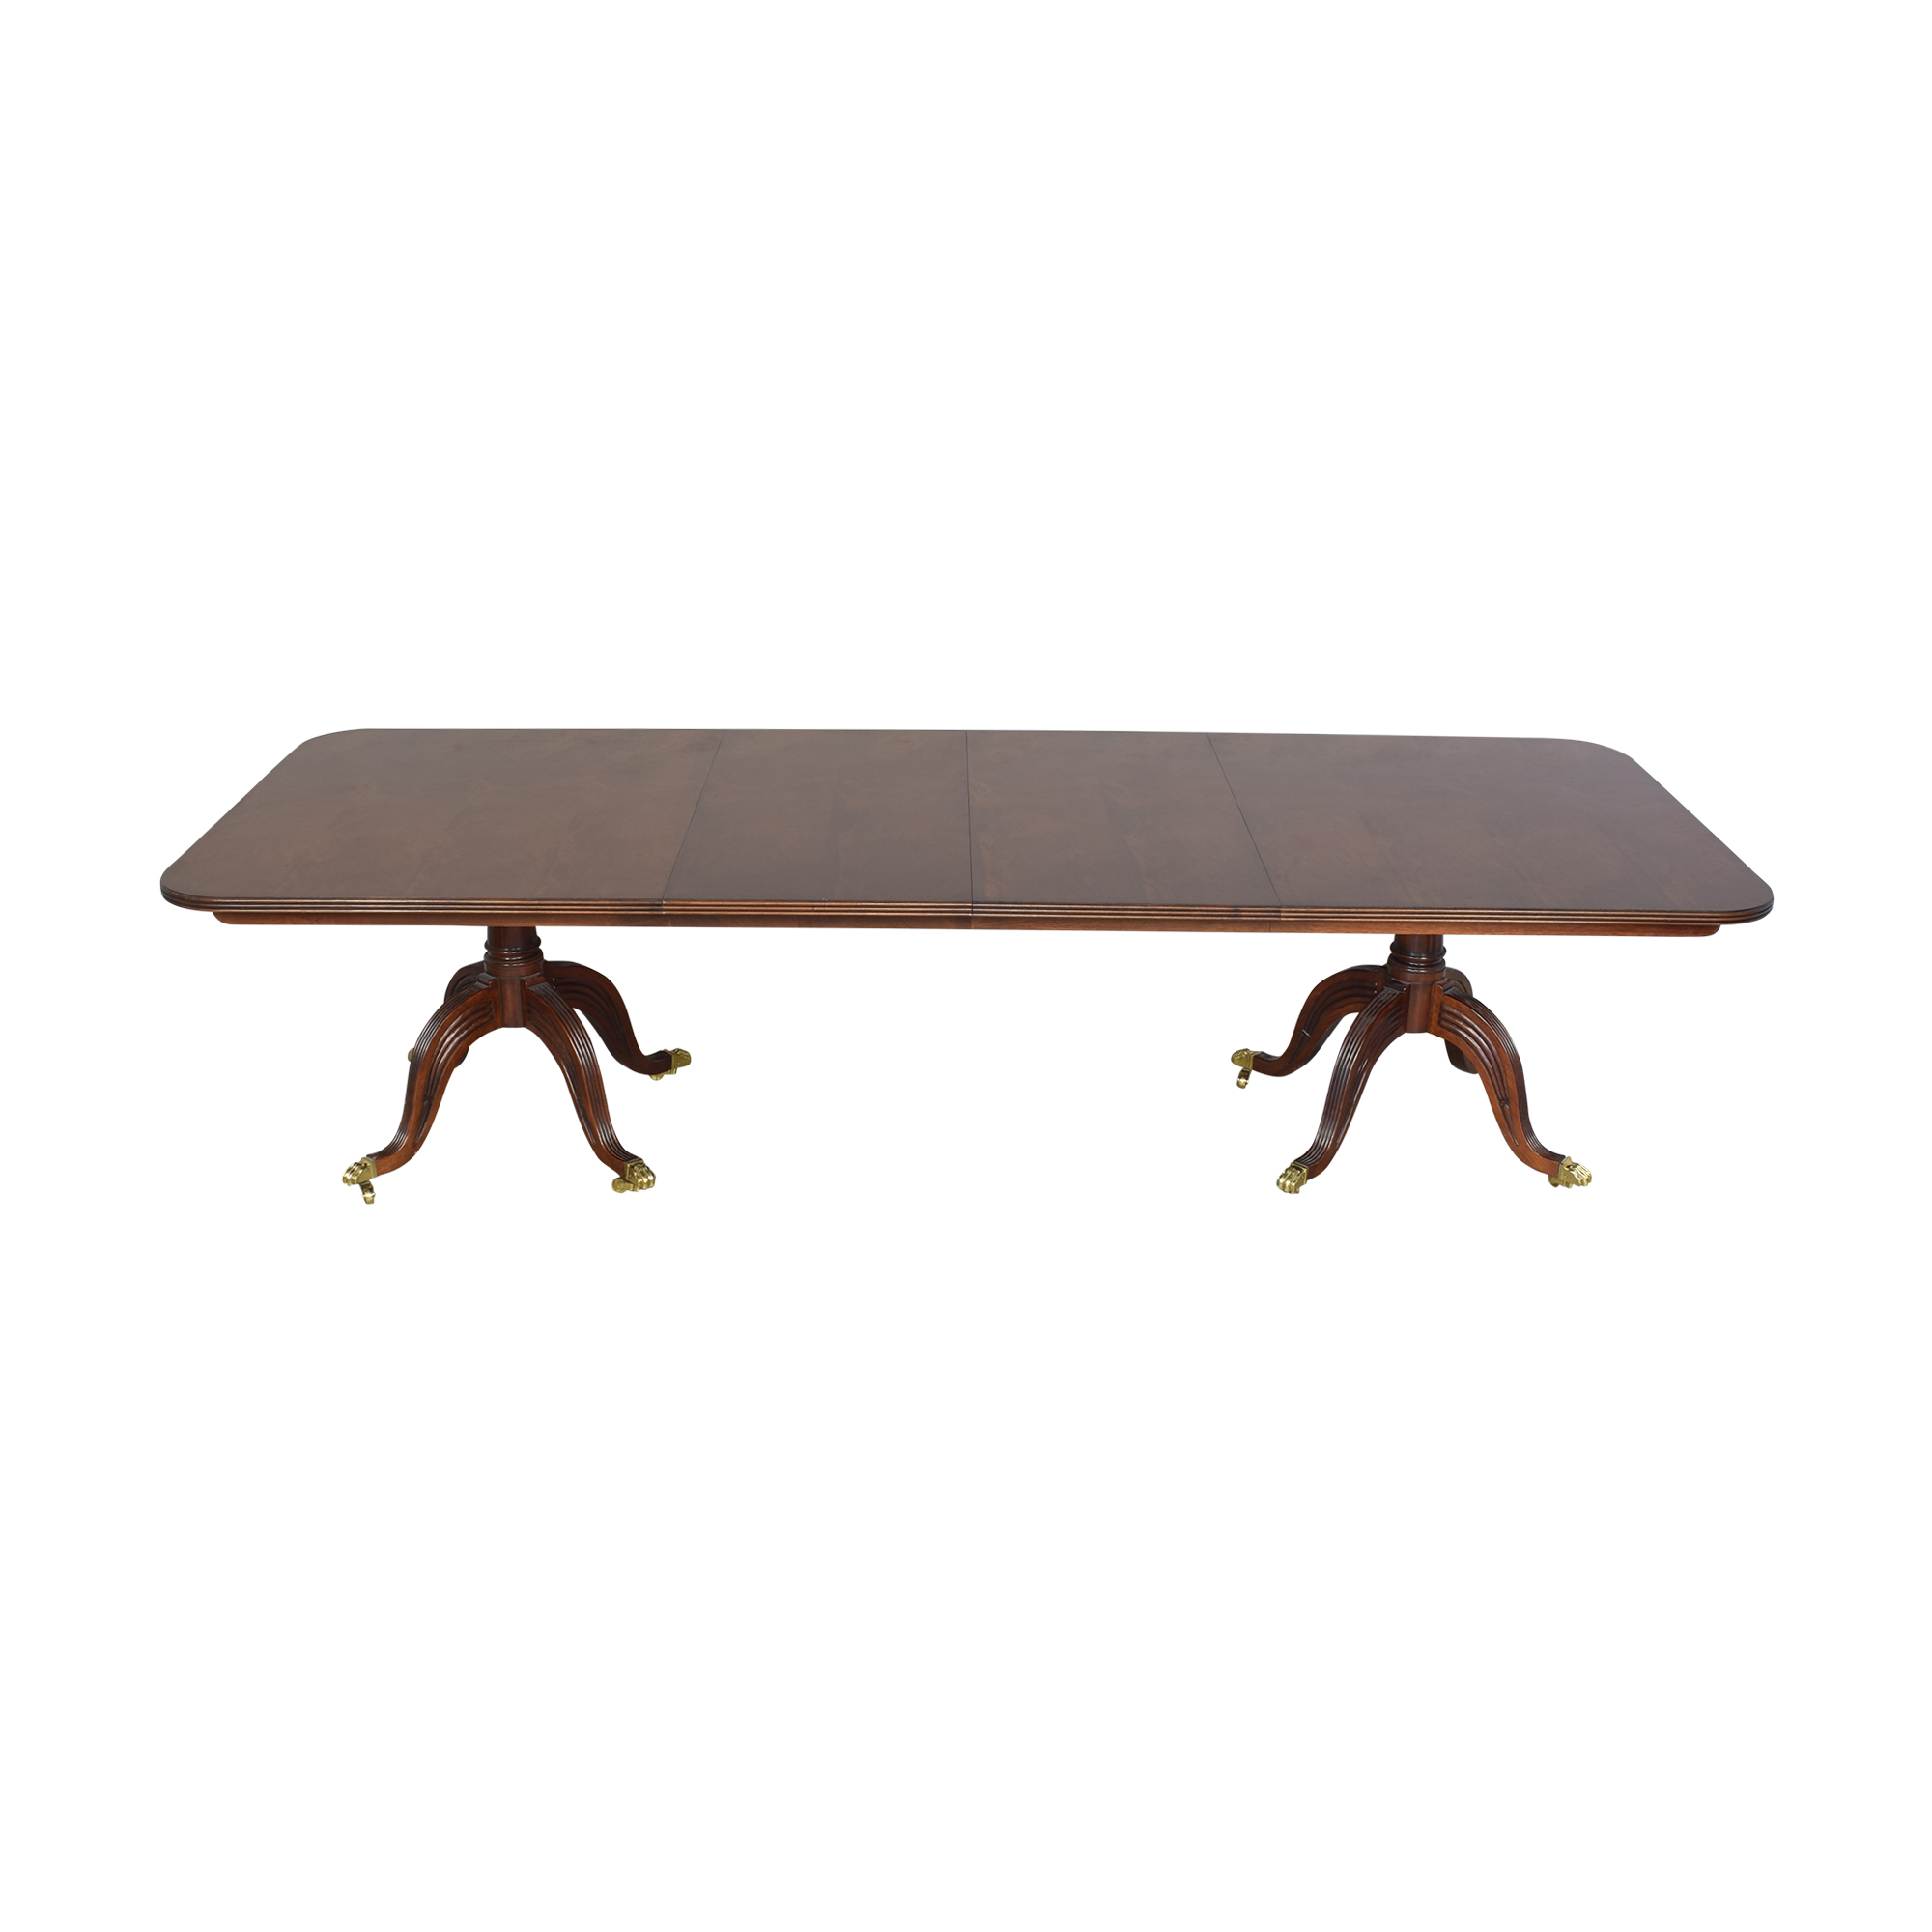 Henredon Furniture Henredon Double Pedestal Extendable Dining Table discount